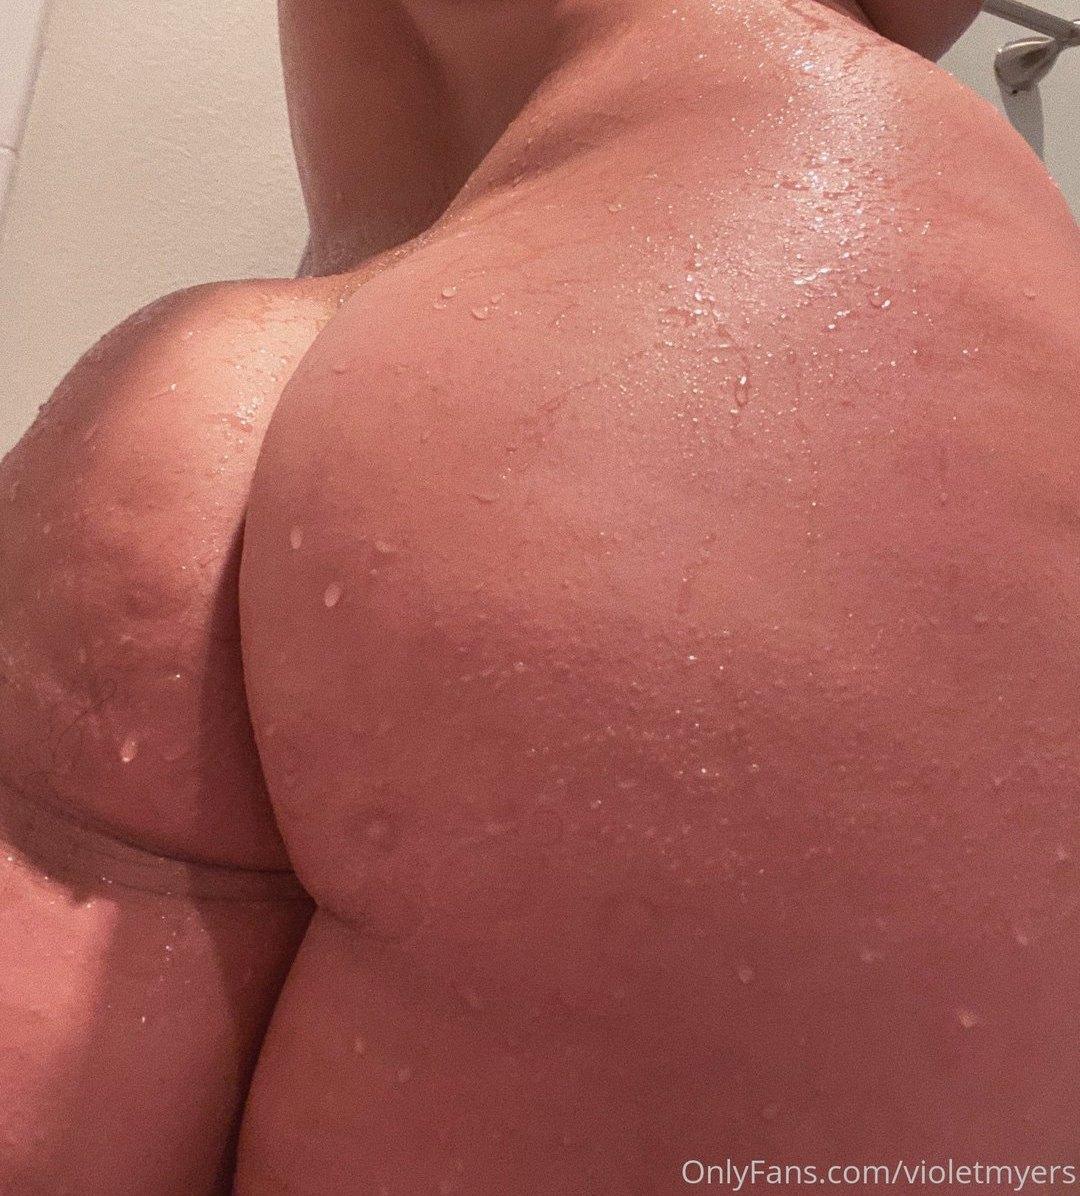 Violet Myers Violetmyers Onlyfans Nudes Leaks 0033